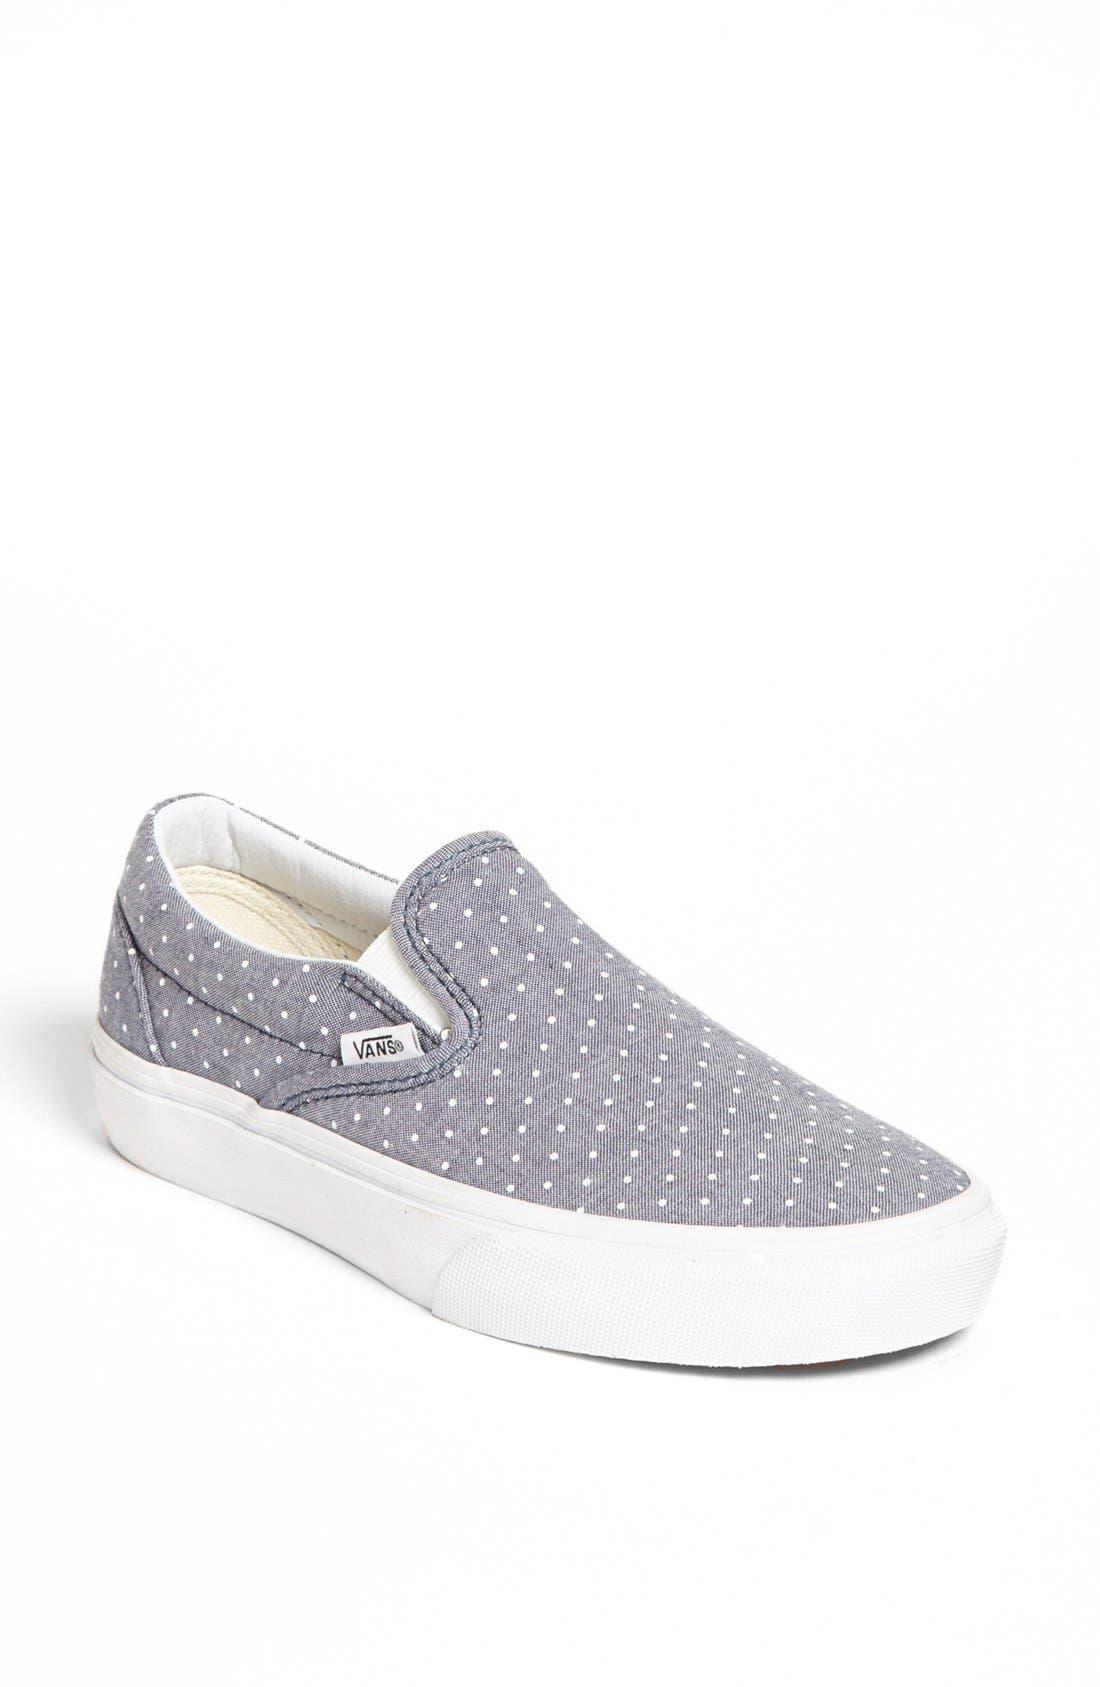 Alternate Image 1 Selected - Vans 'Classic' Sneaker (Women)